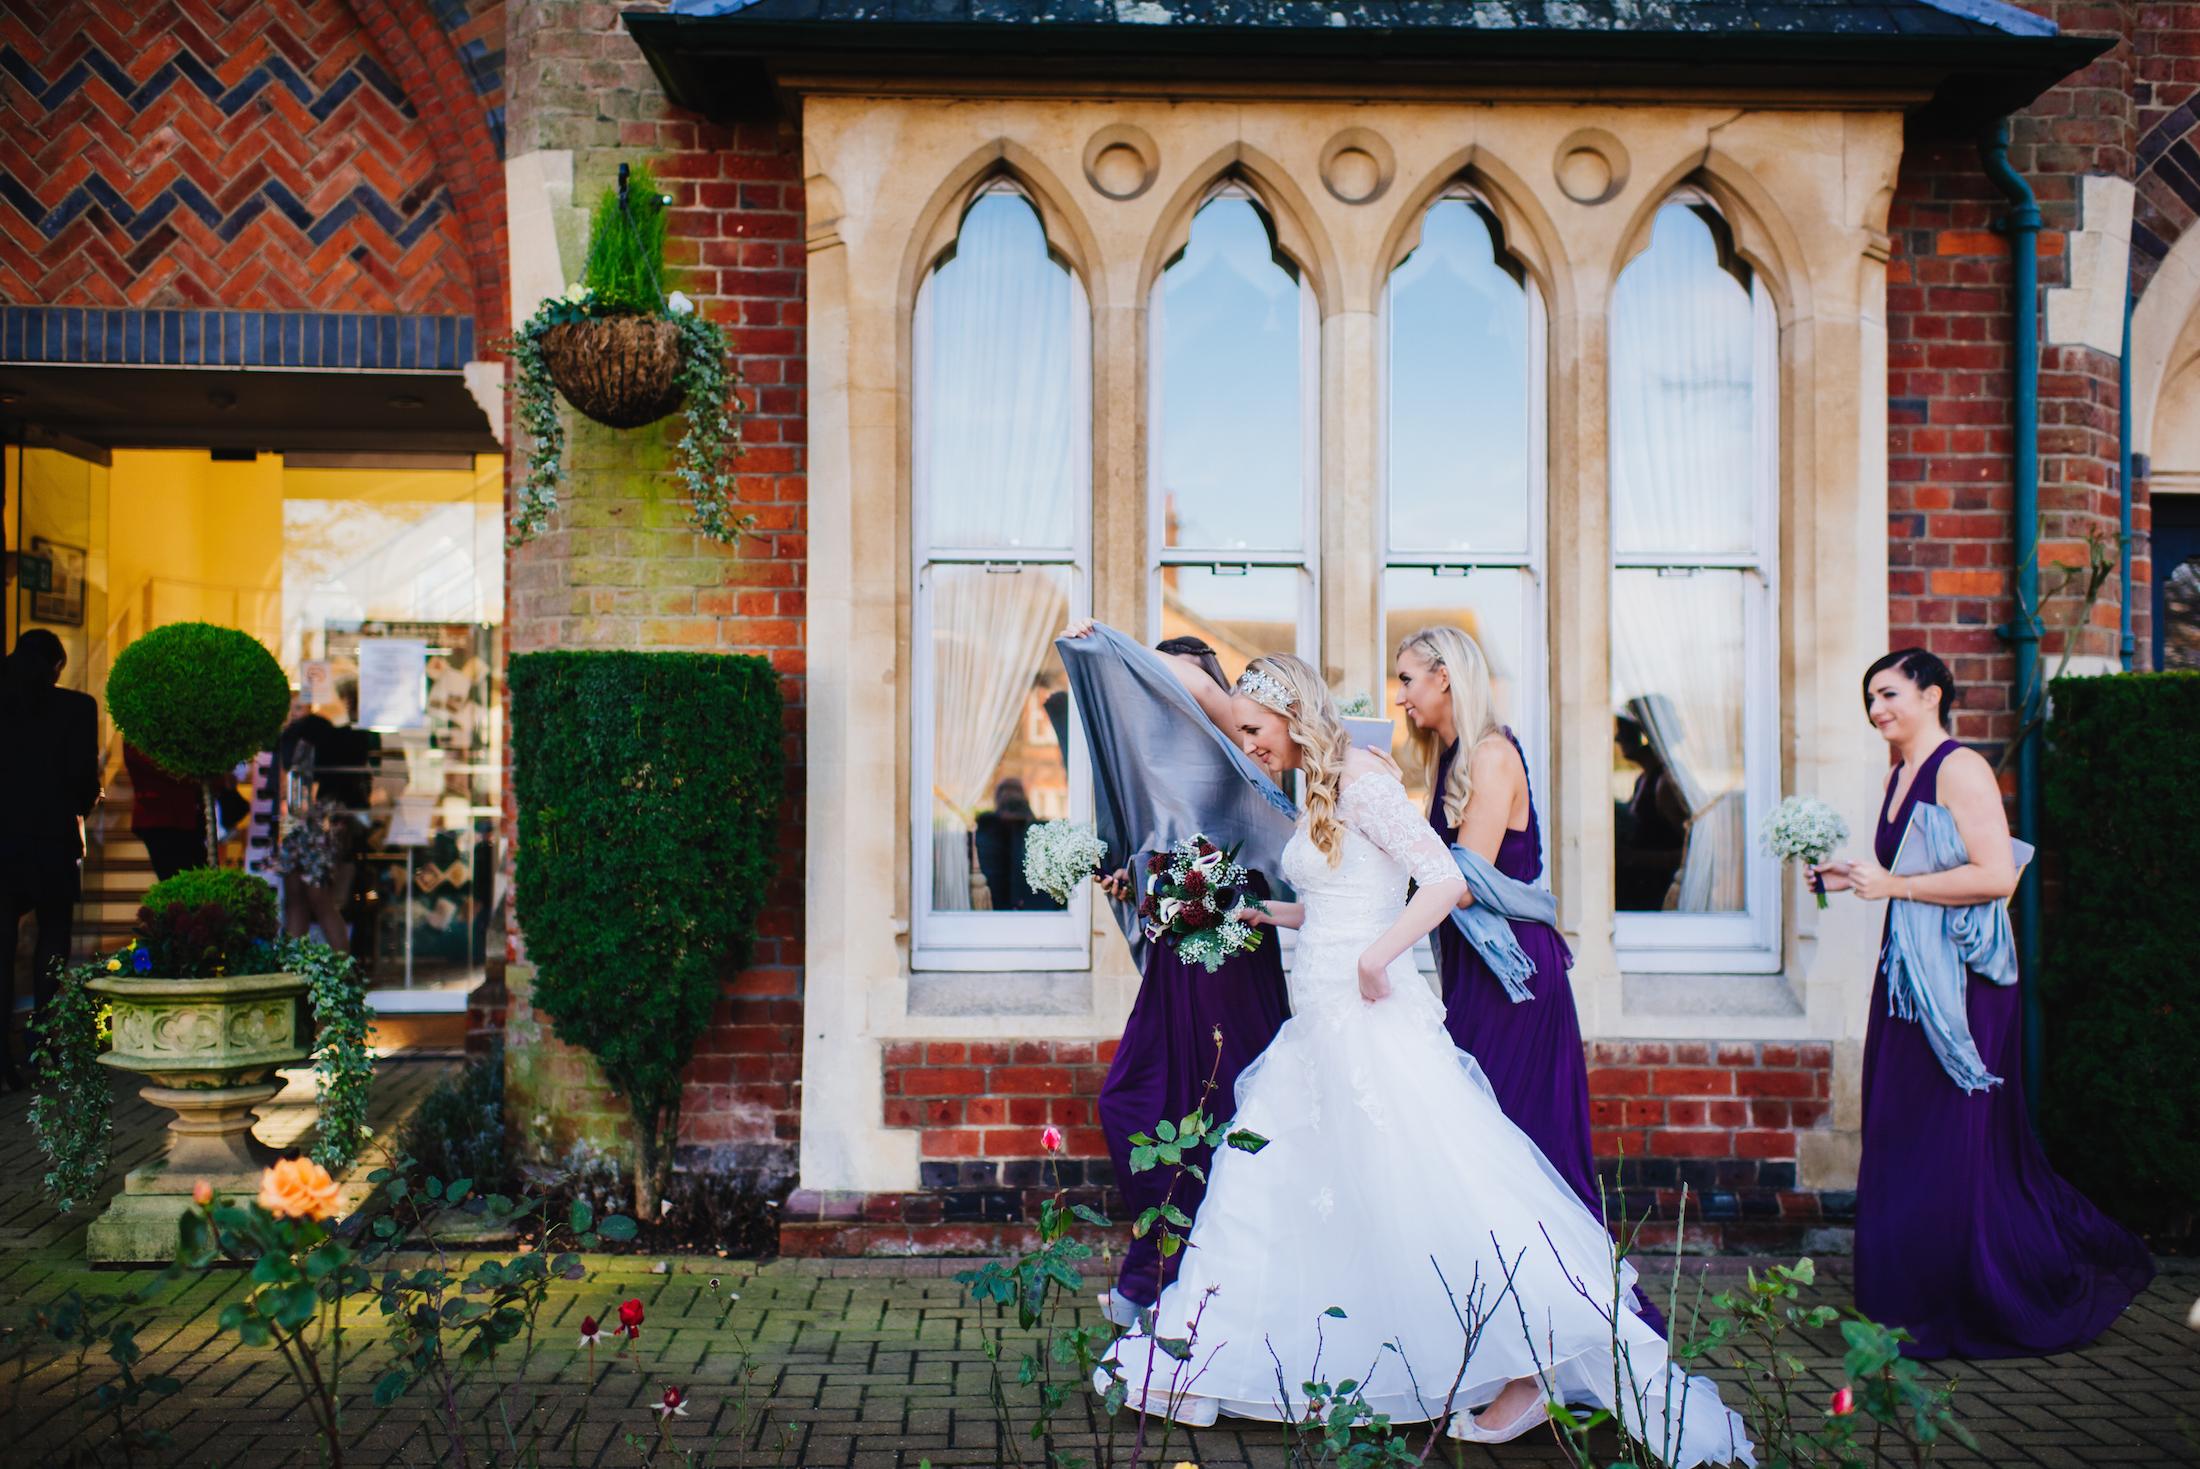 112 Bride Groom London Wedding Photography.jpg